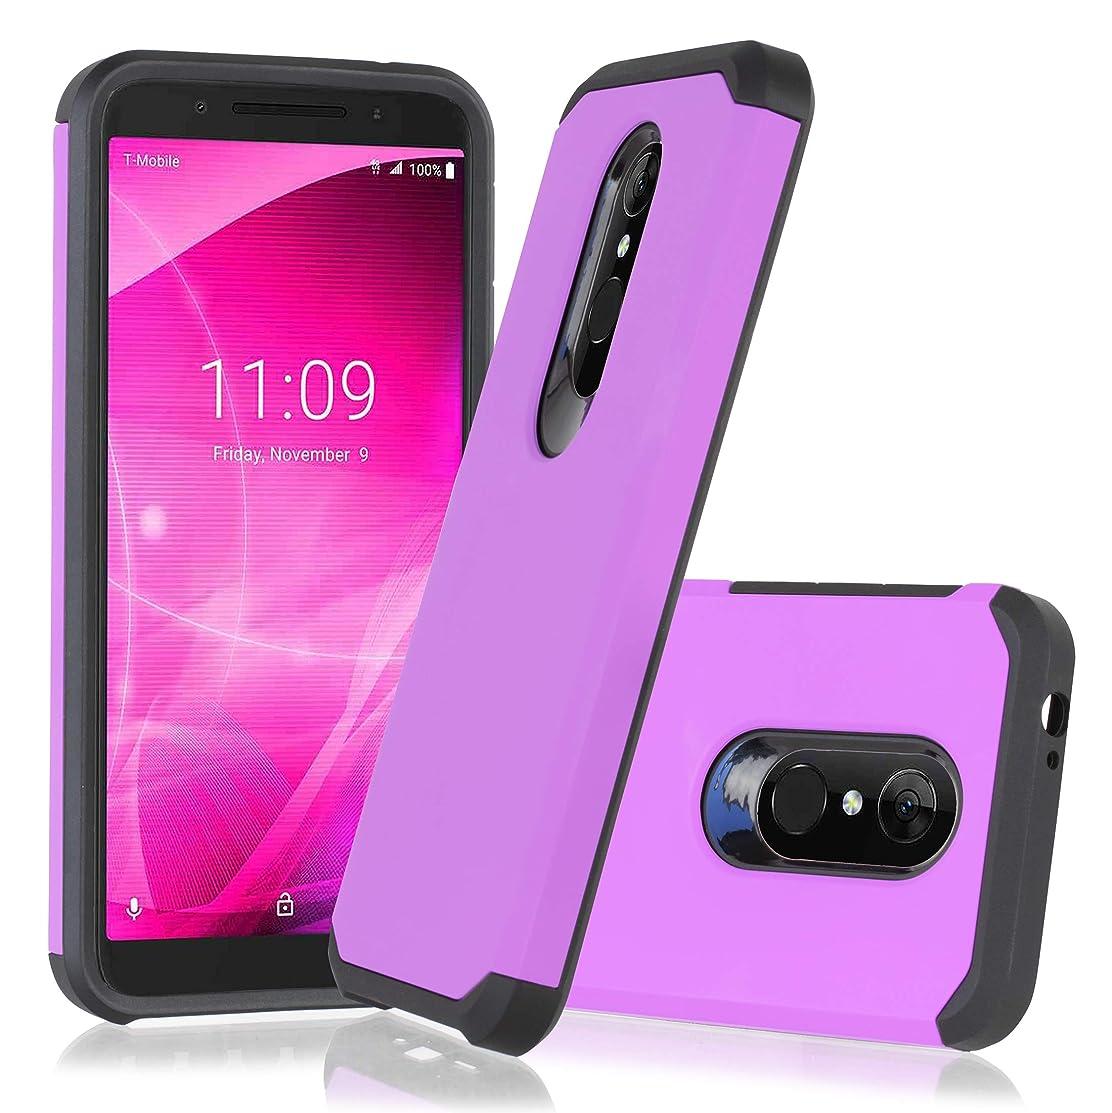 T-Mobile Revvl 2 (5.5 inch) 2018 Cover Heavy Duty Defender Shock Proof Impact Resist Dual Layer Hybrid Protective Combo TPU Phone Case for Alcatel Revvl 2 (Purple)